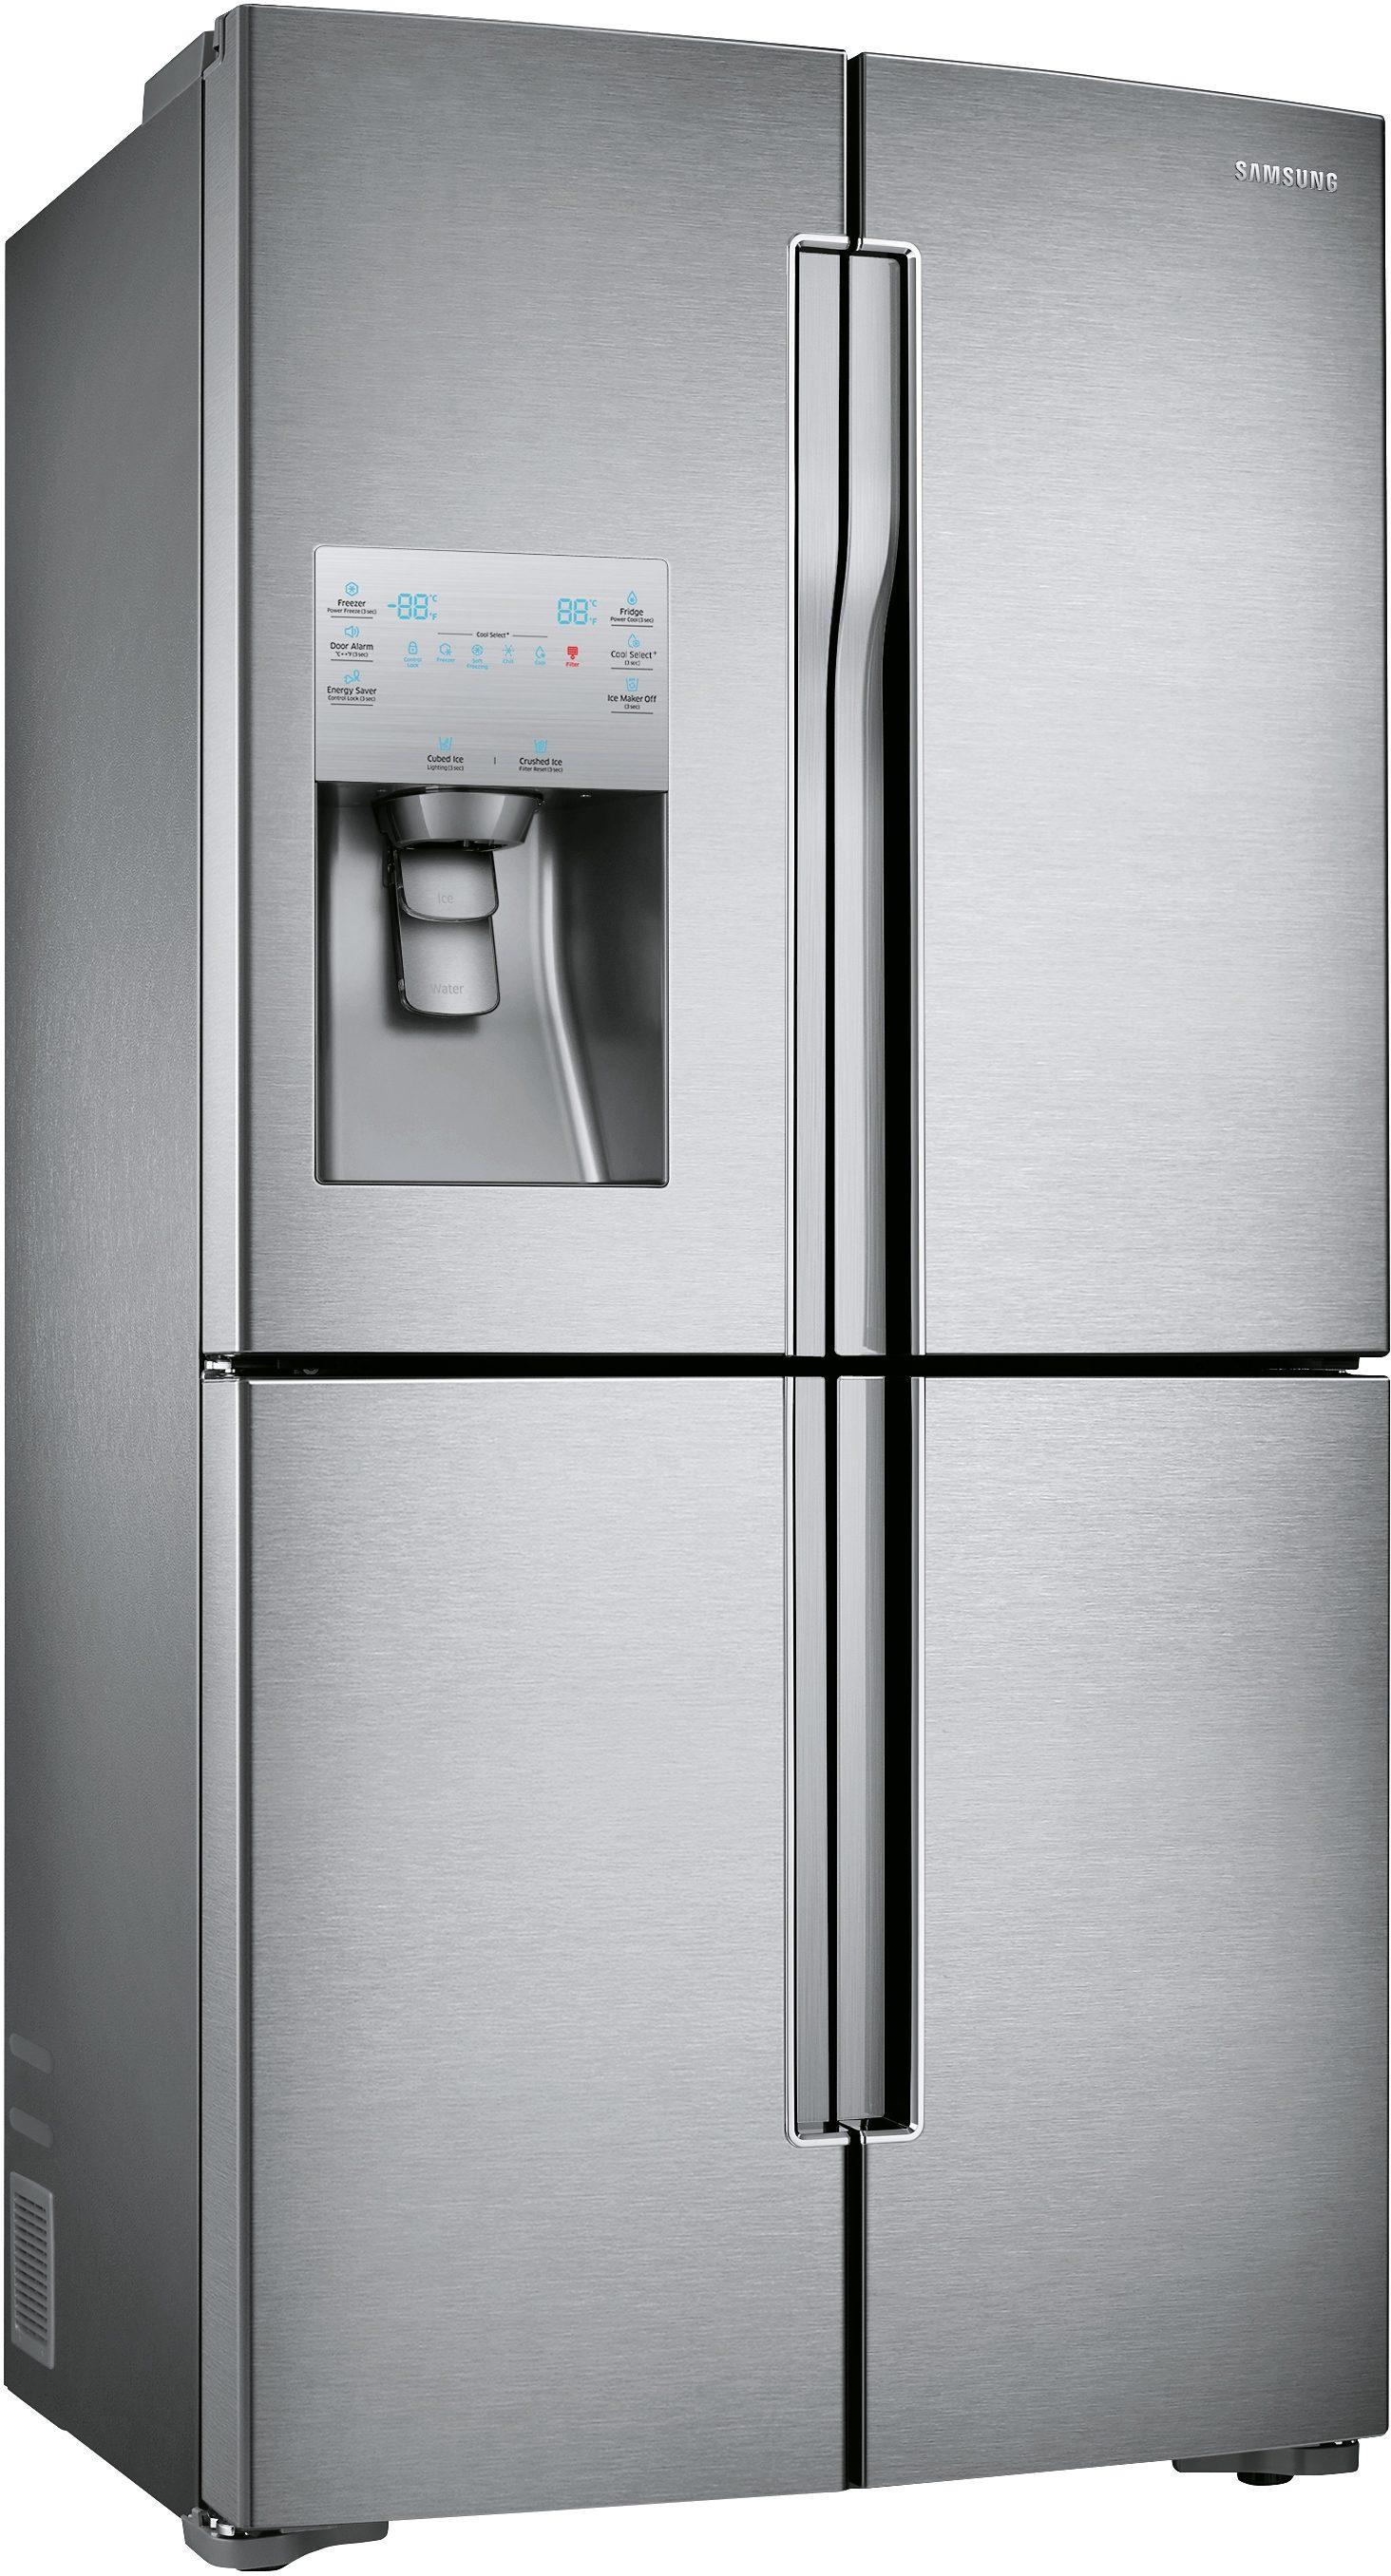 Samsung Side-by-Side RF56J9041SR, 182,5 cm hoch, 90,8 cm breit